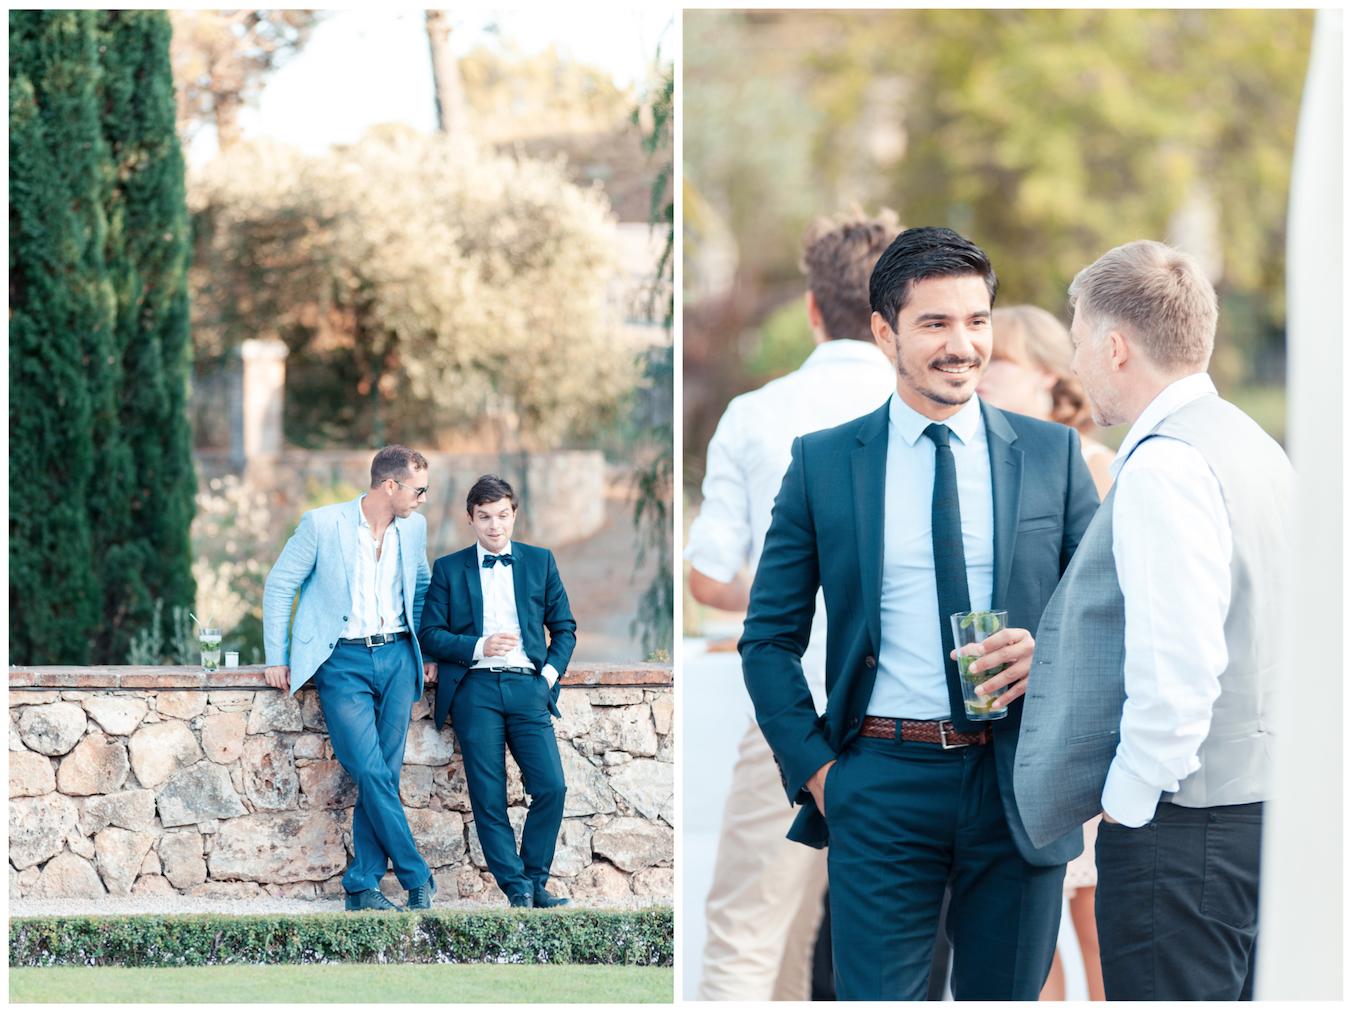 Font-du-Broc-Provence-Wedding-Photographer-04